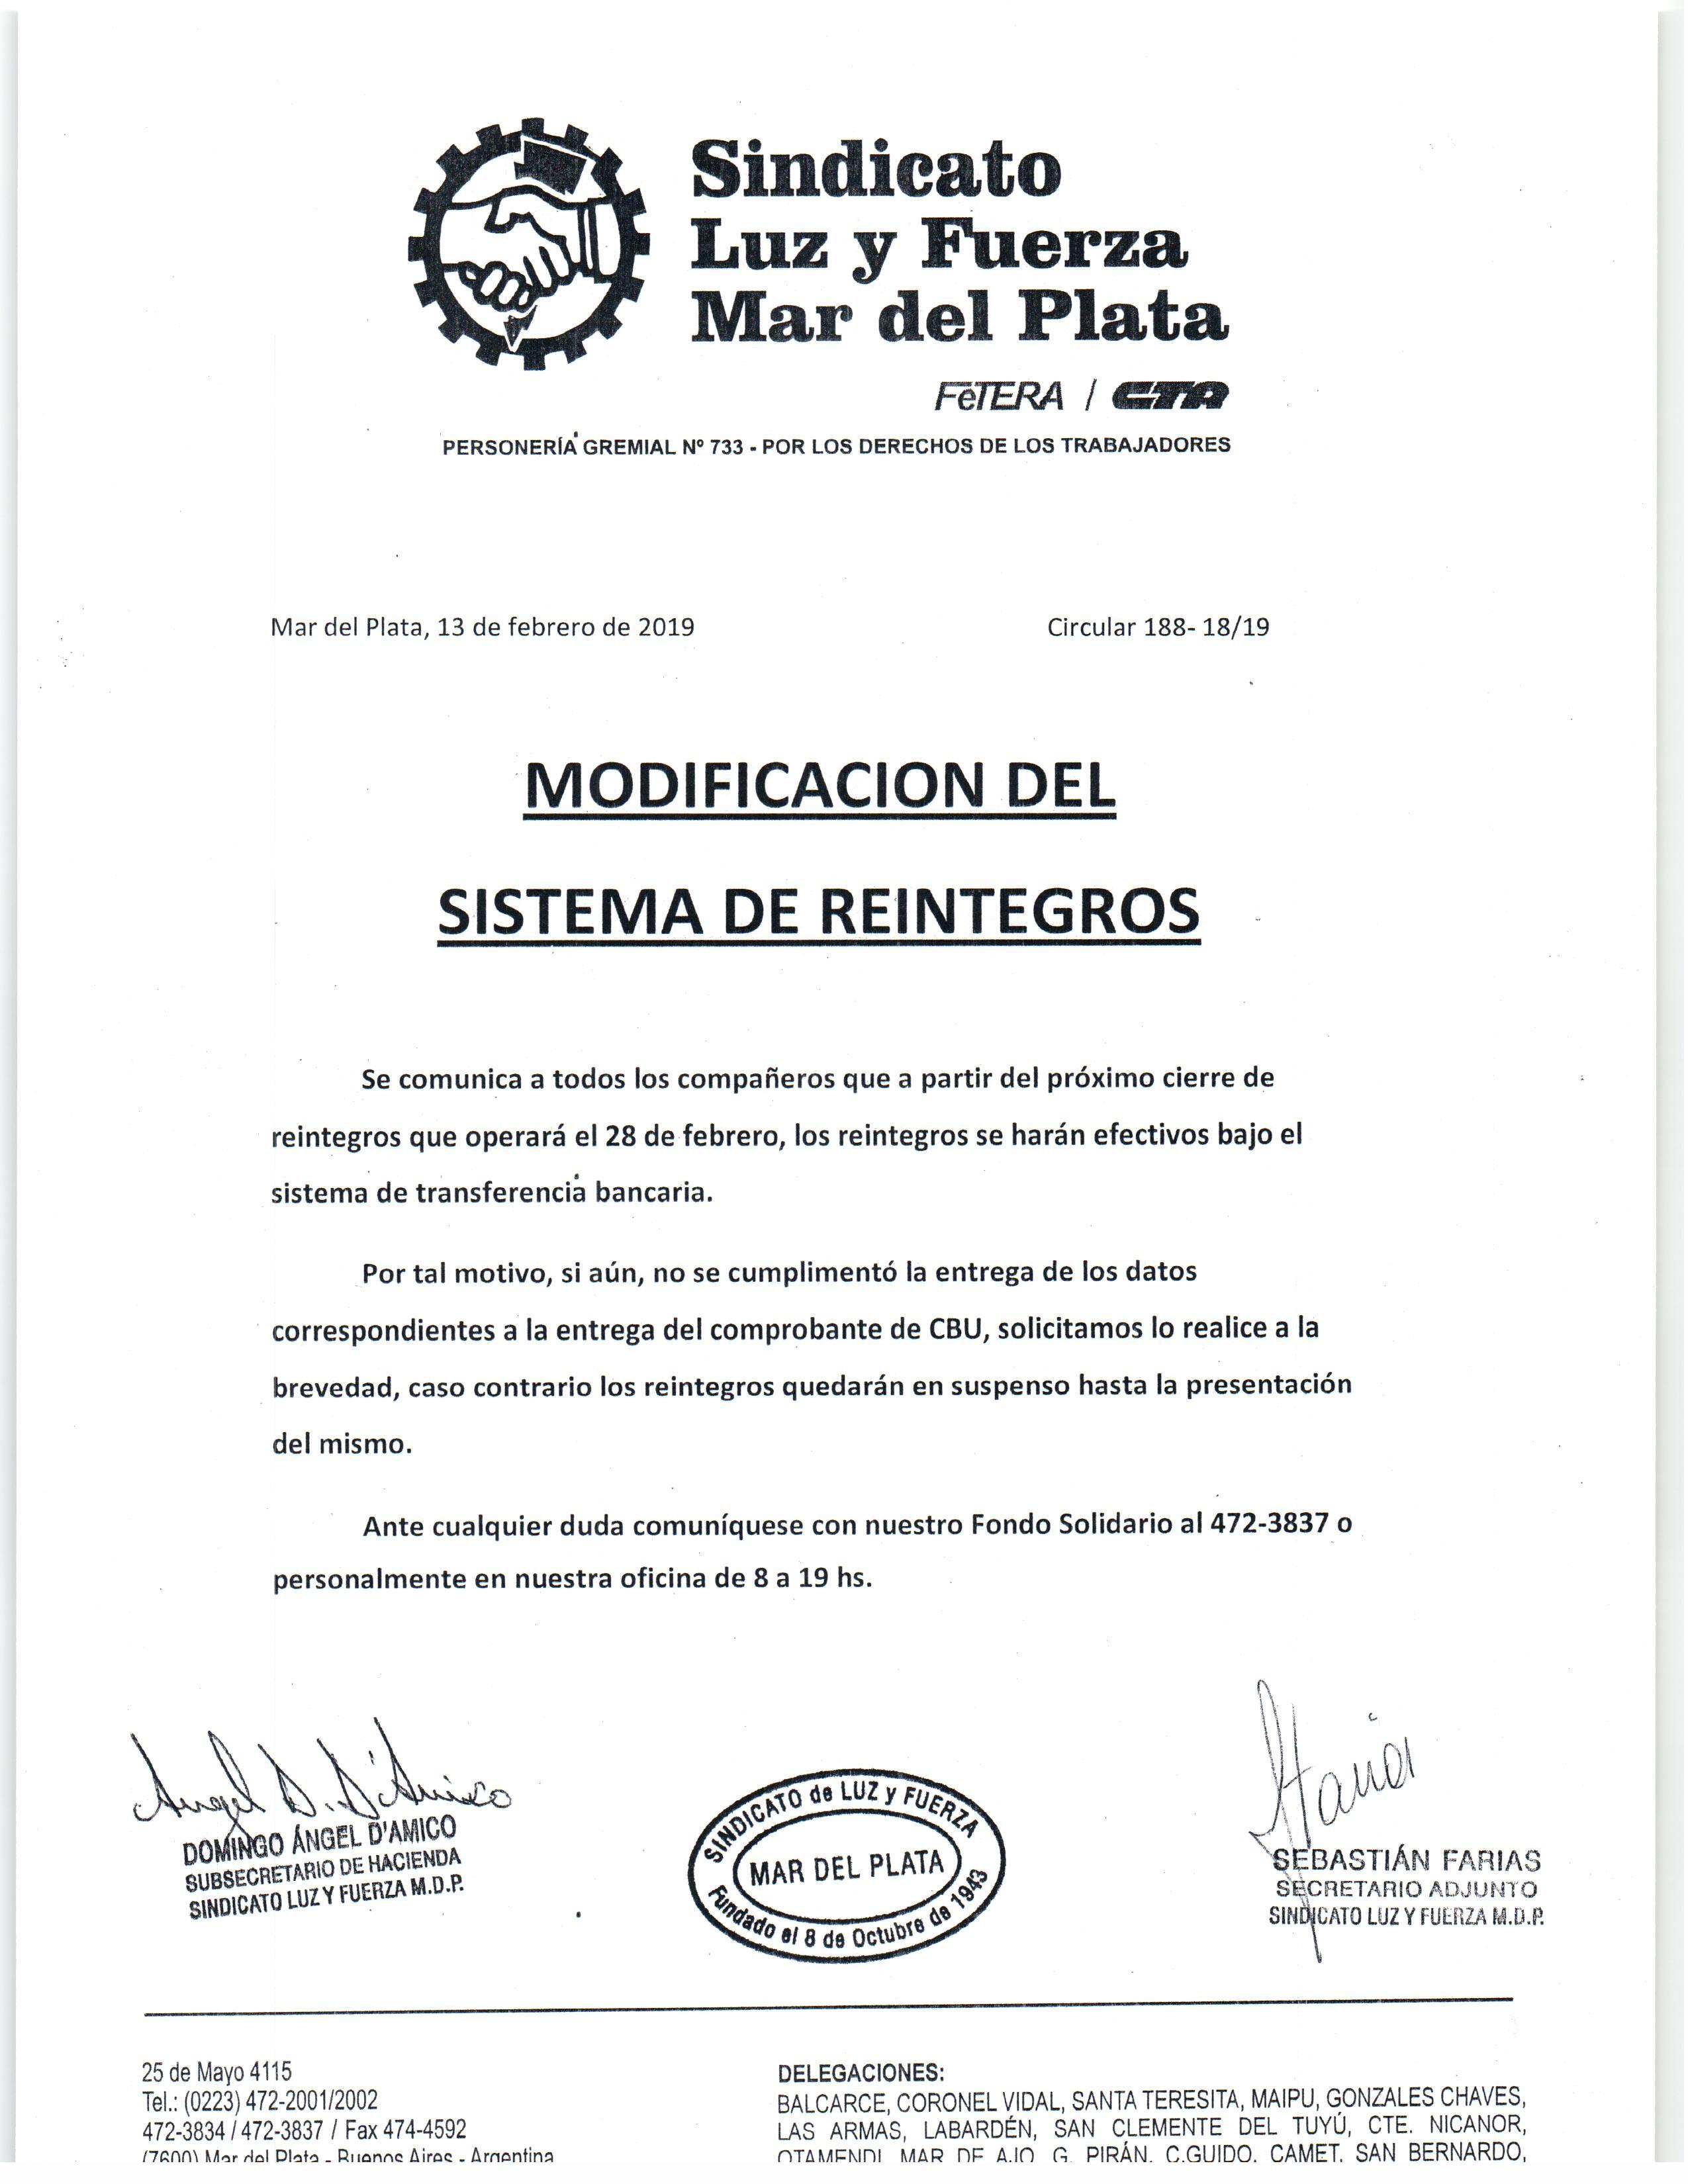 MODIFICACIÓN DEL SISTEMA DE REINTEGROS DE FOSOLyF